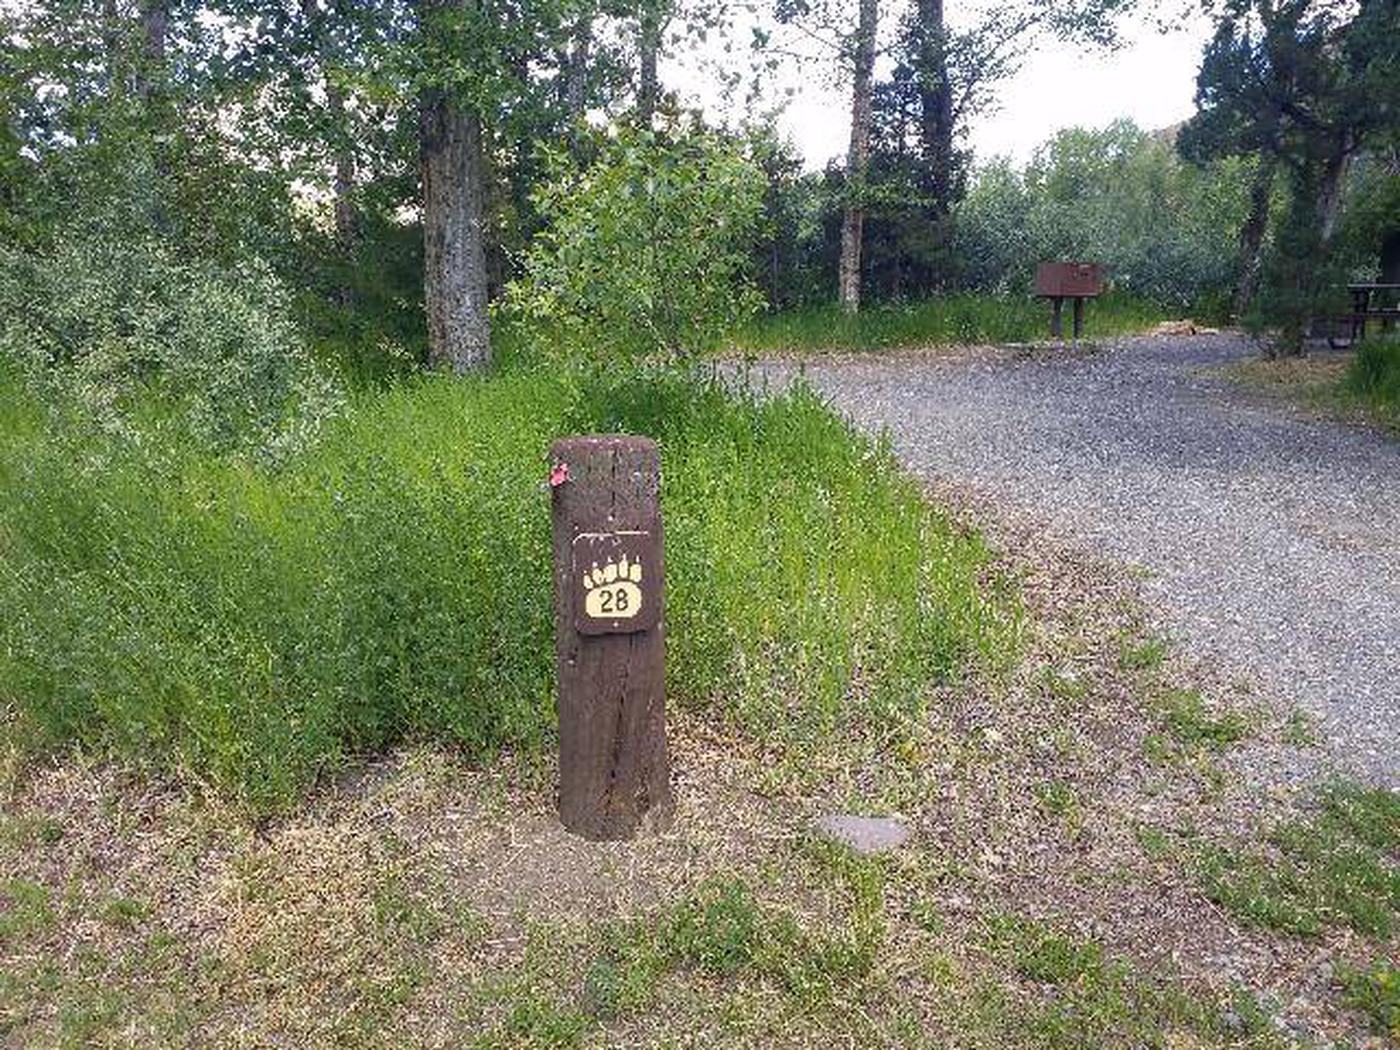 Wapiti Campsite 28 - Post